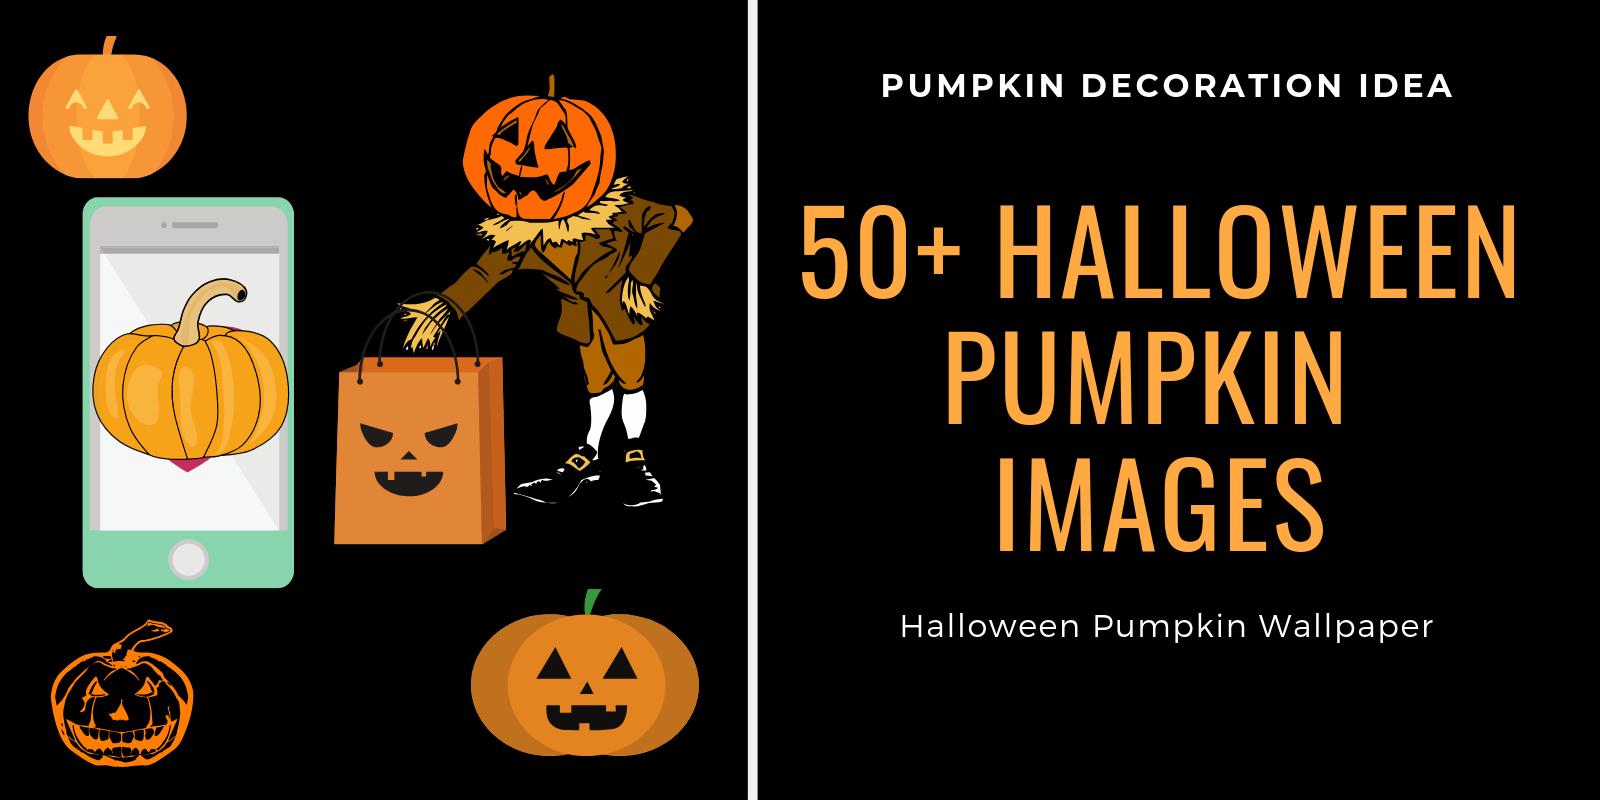 Halloween pumpkin image wallpaper